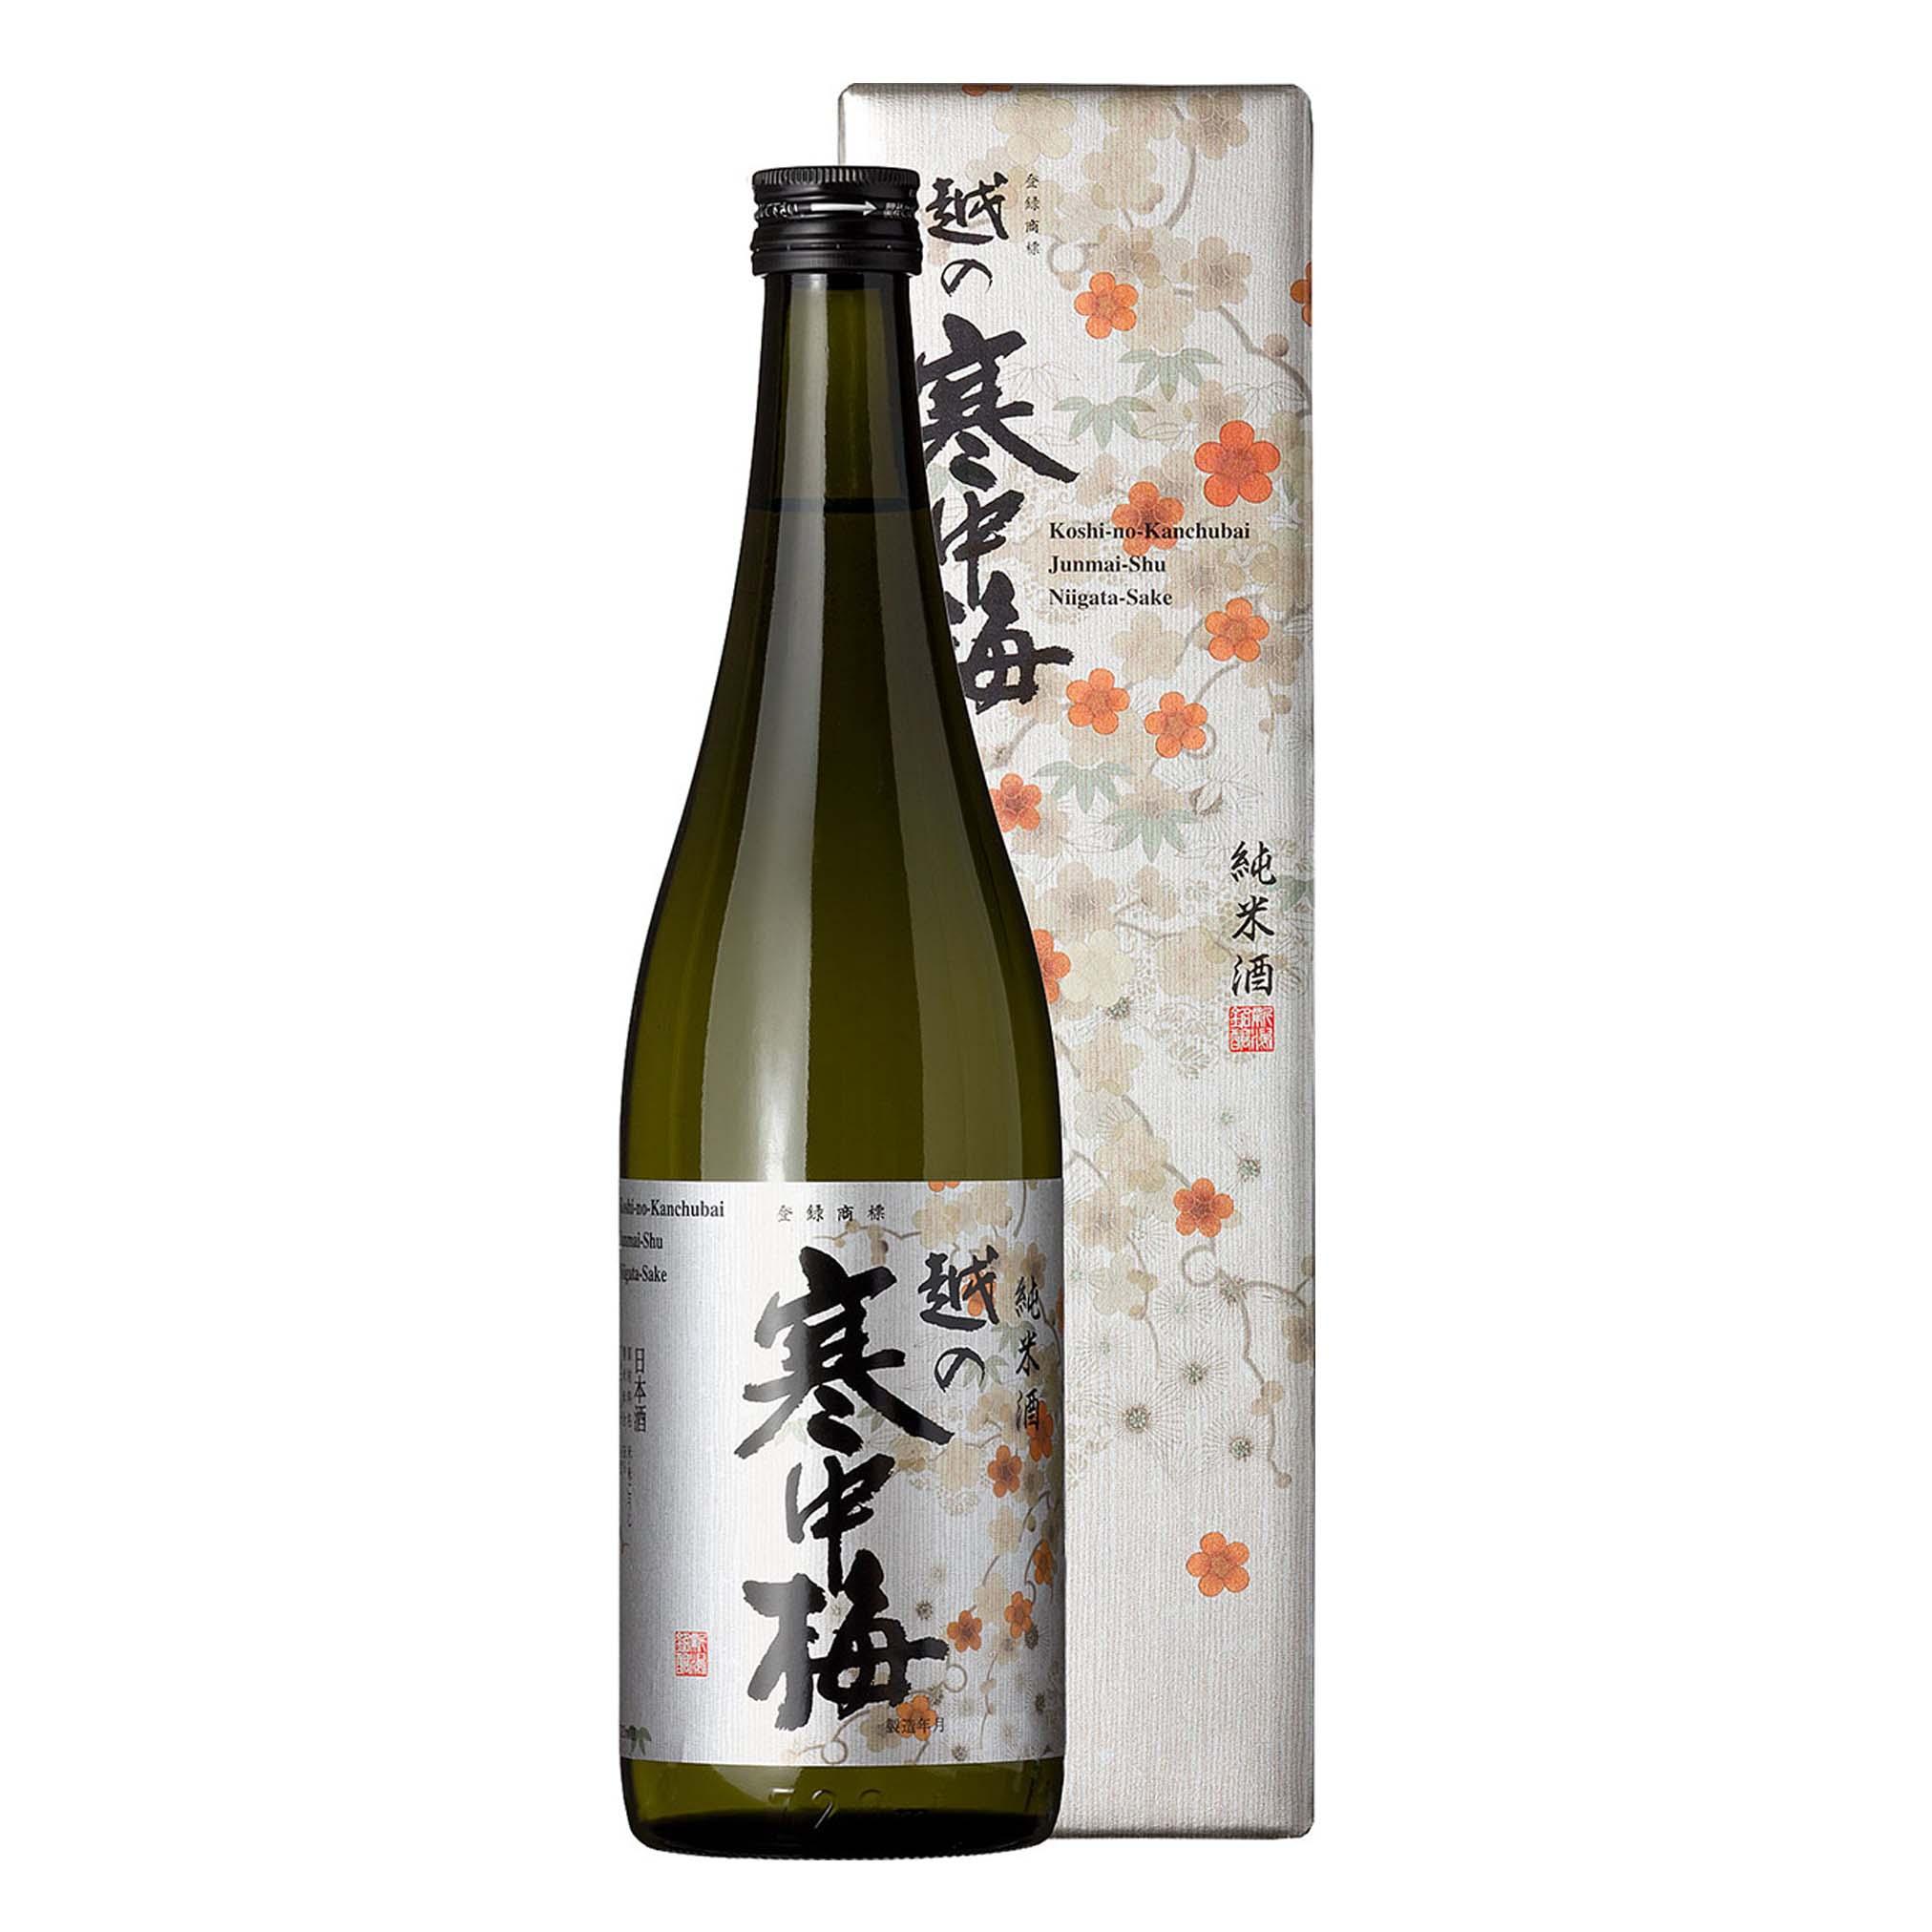 Koshinokanchubai Gin Label Junmai Shu 14% 720ml